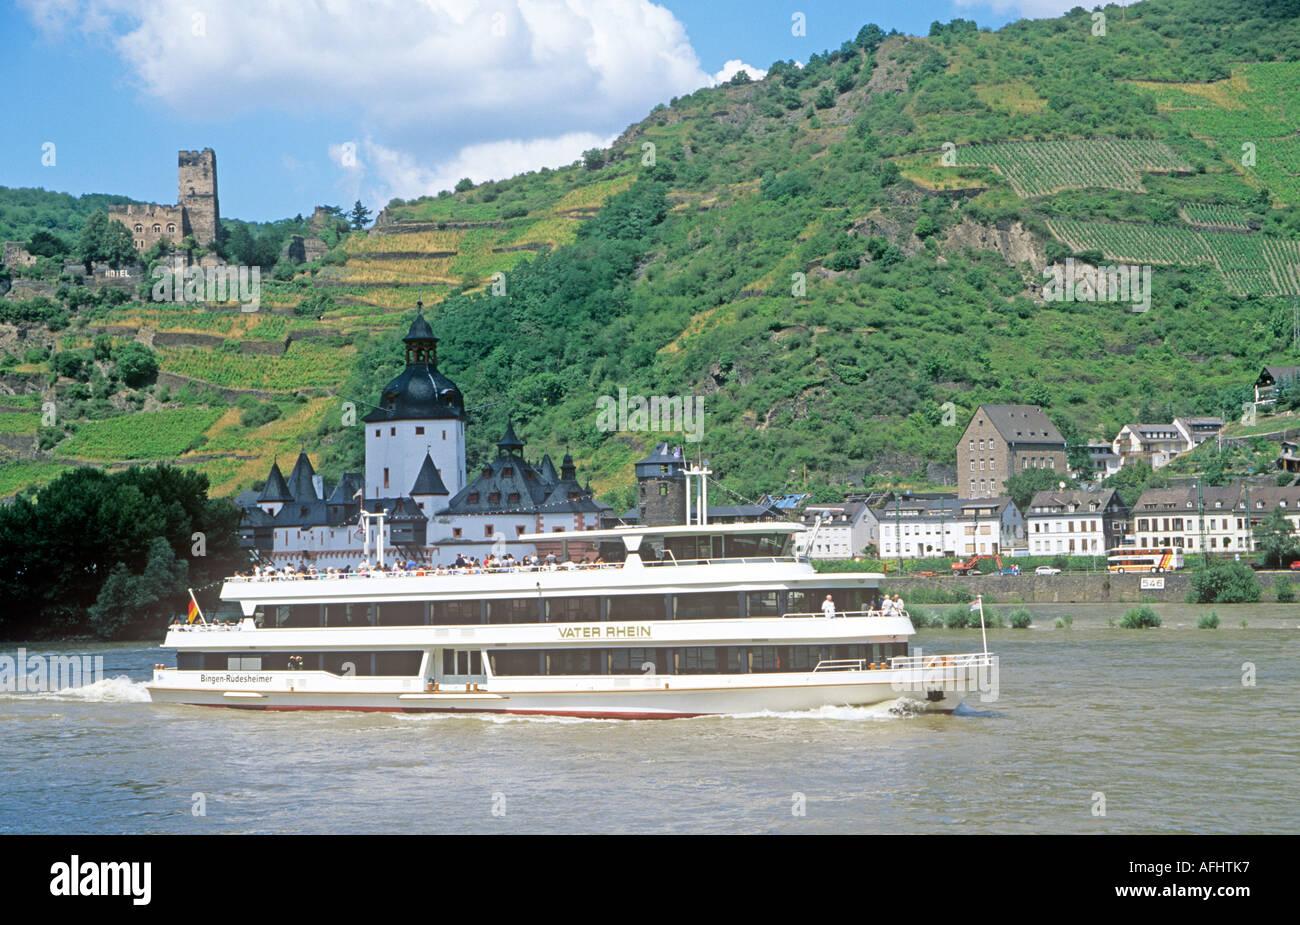 Rhine River Cruise Ship RhinelandPalatinate Germany Europe - River cruise ships europe